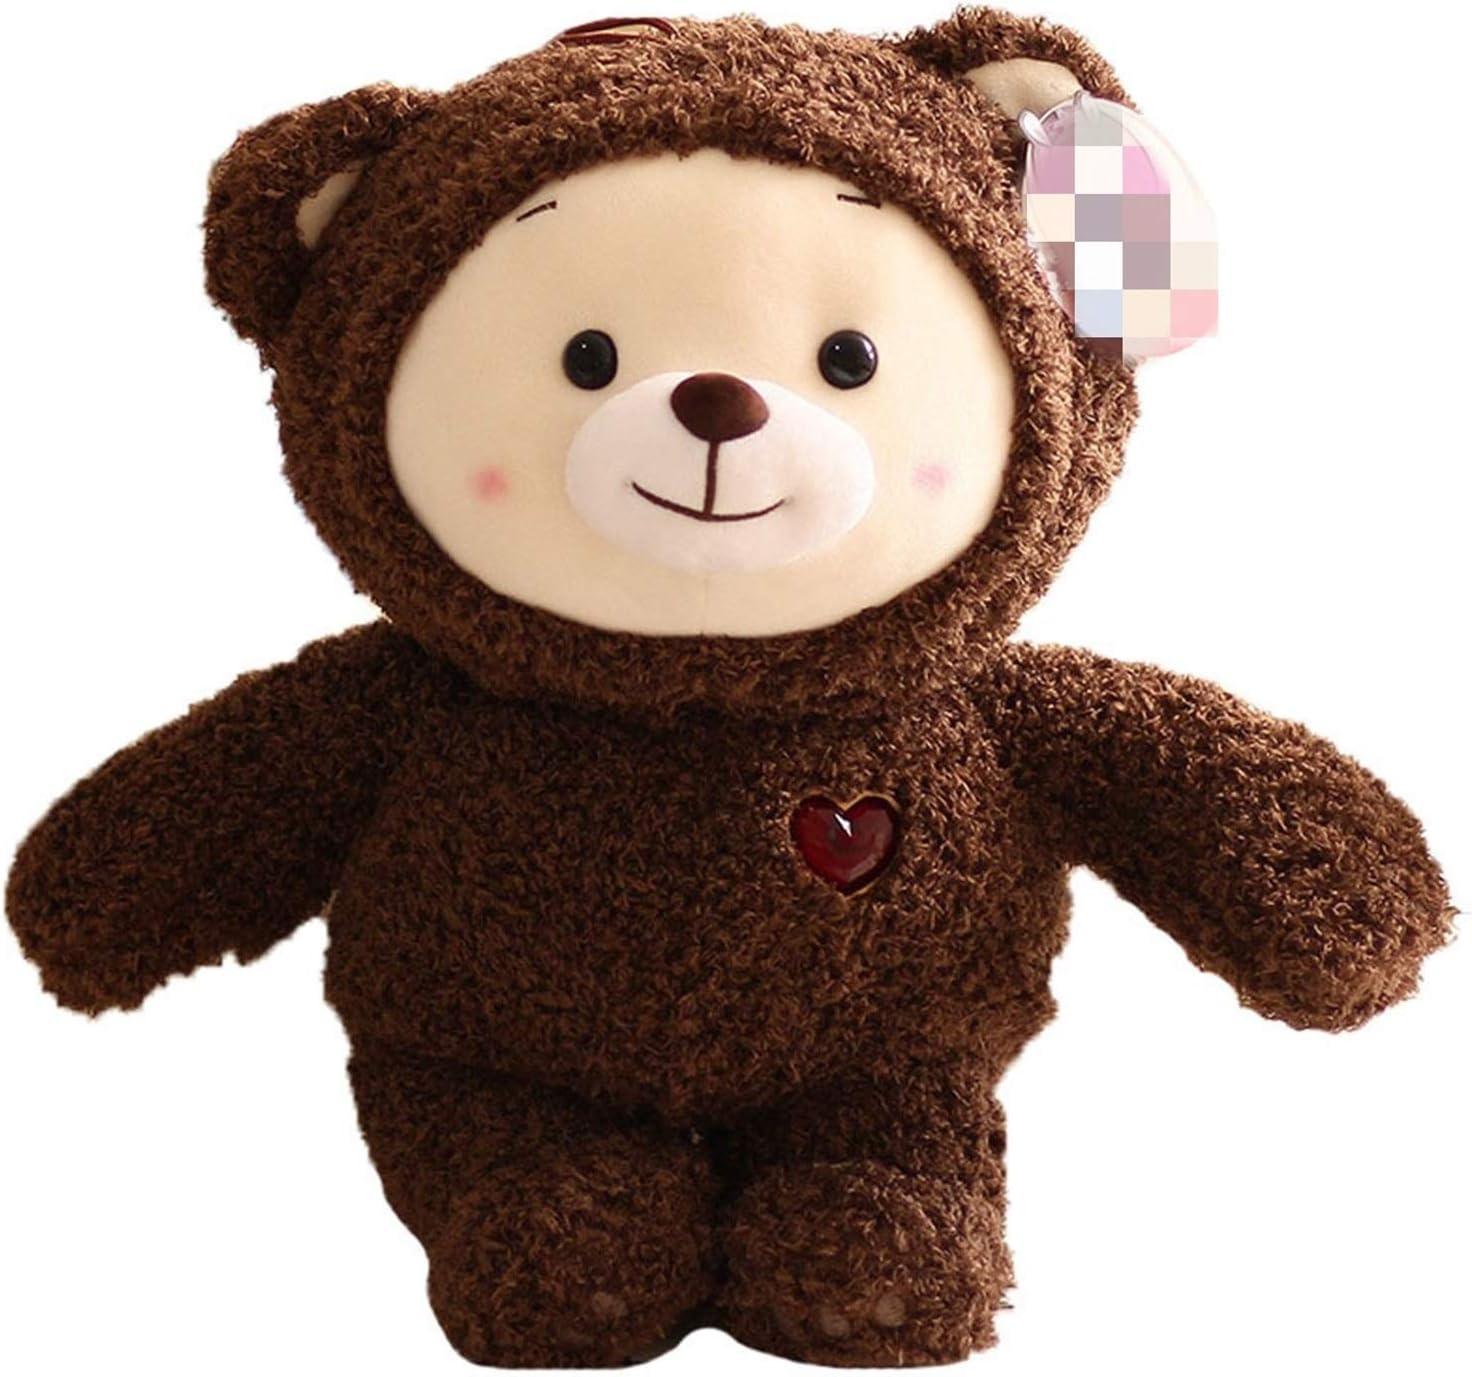 JUNMAIDZ Limited Milwaukee Mall time trial price Plush Toys 25cm Bear Stuffed Deer Carto Soft